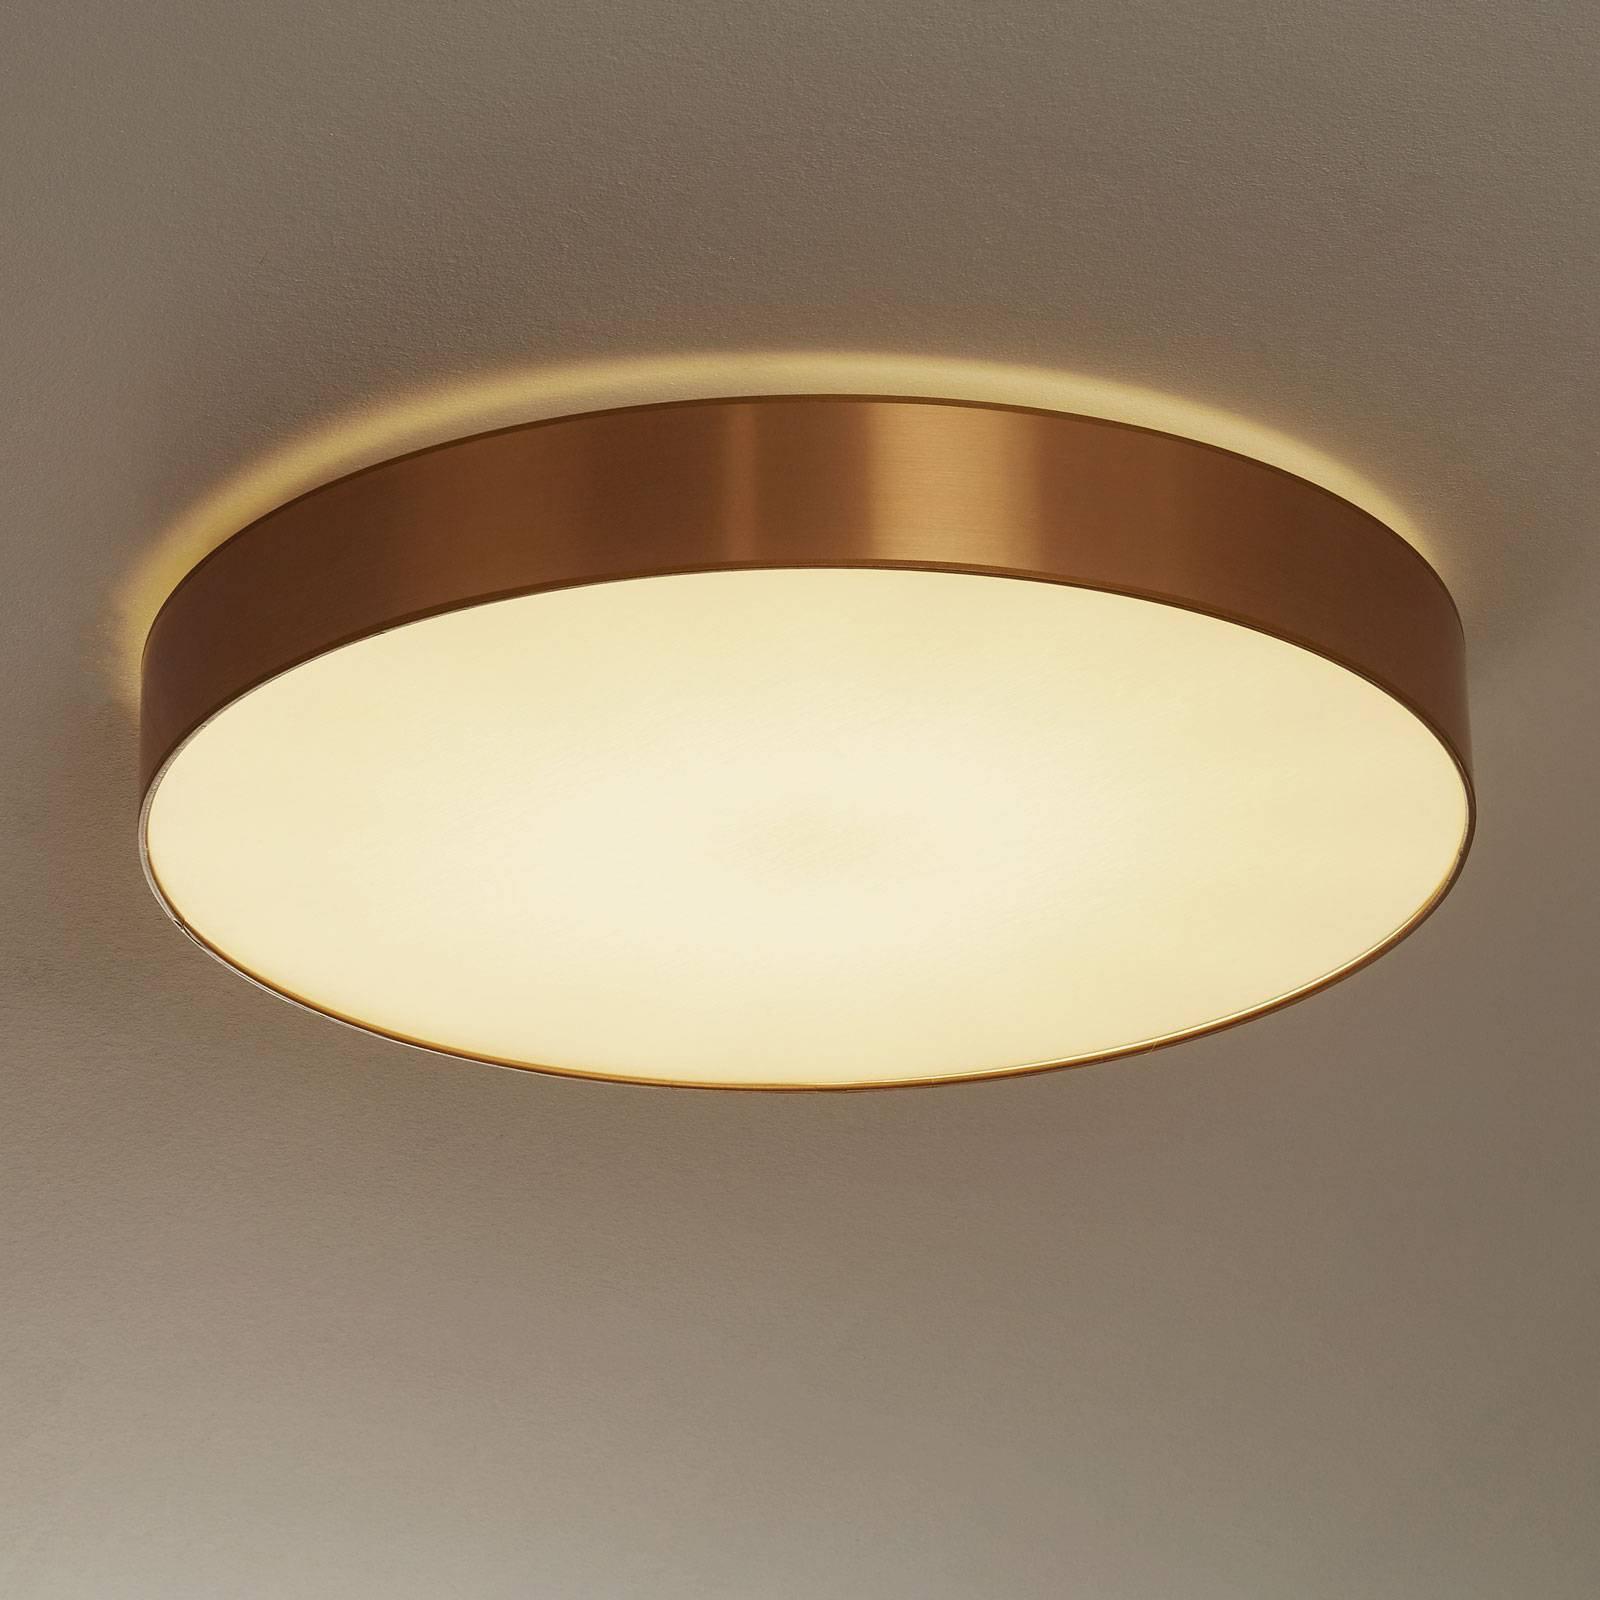 Aurelias taklampe dimbar 60 cm gullfarget